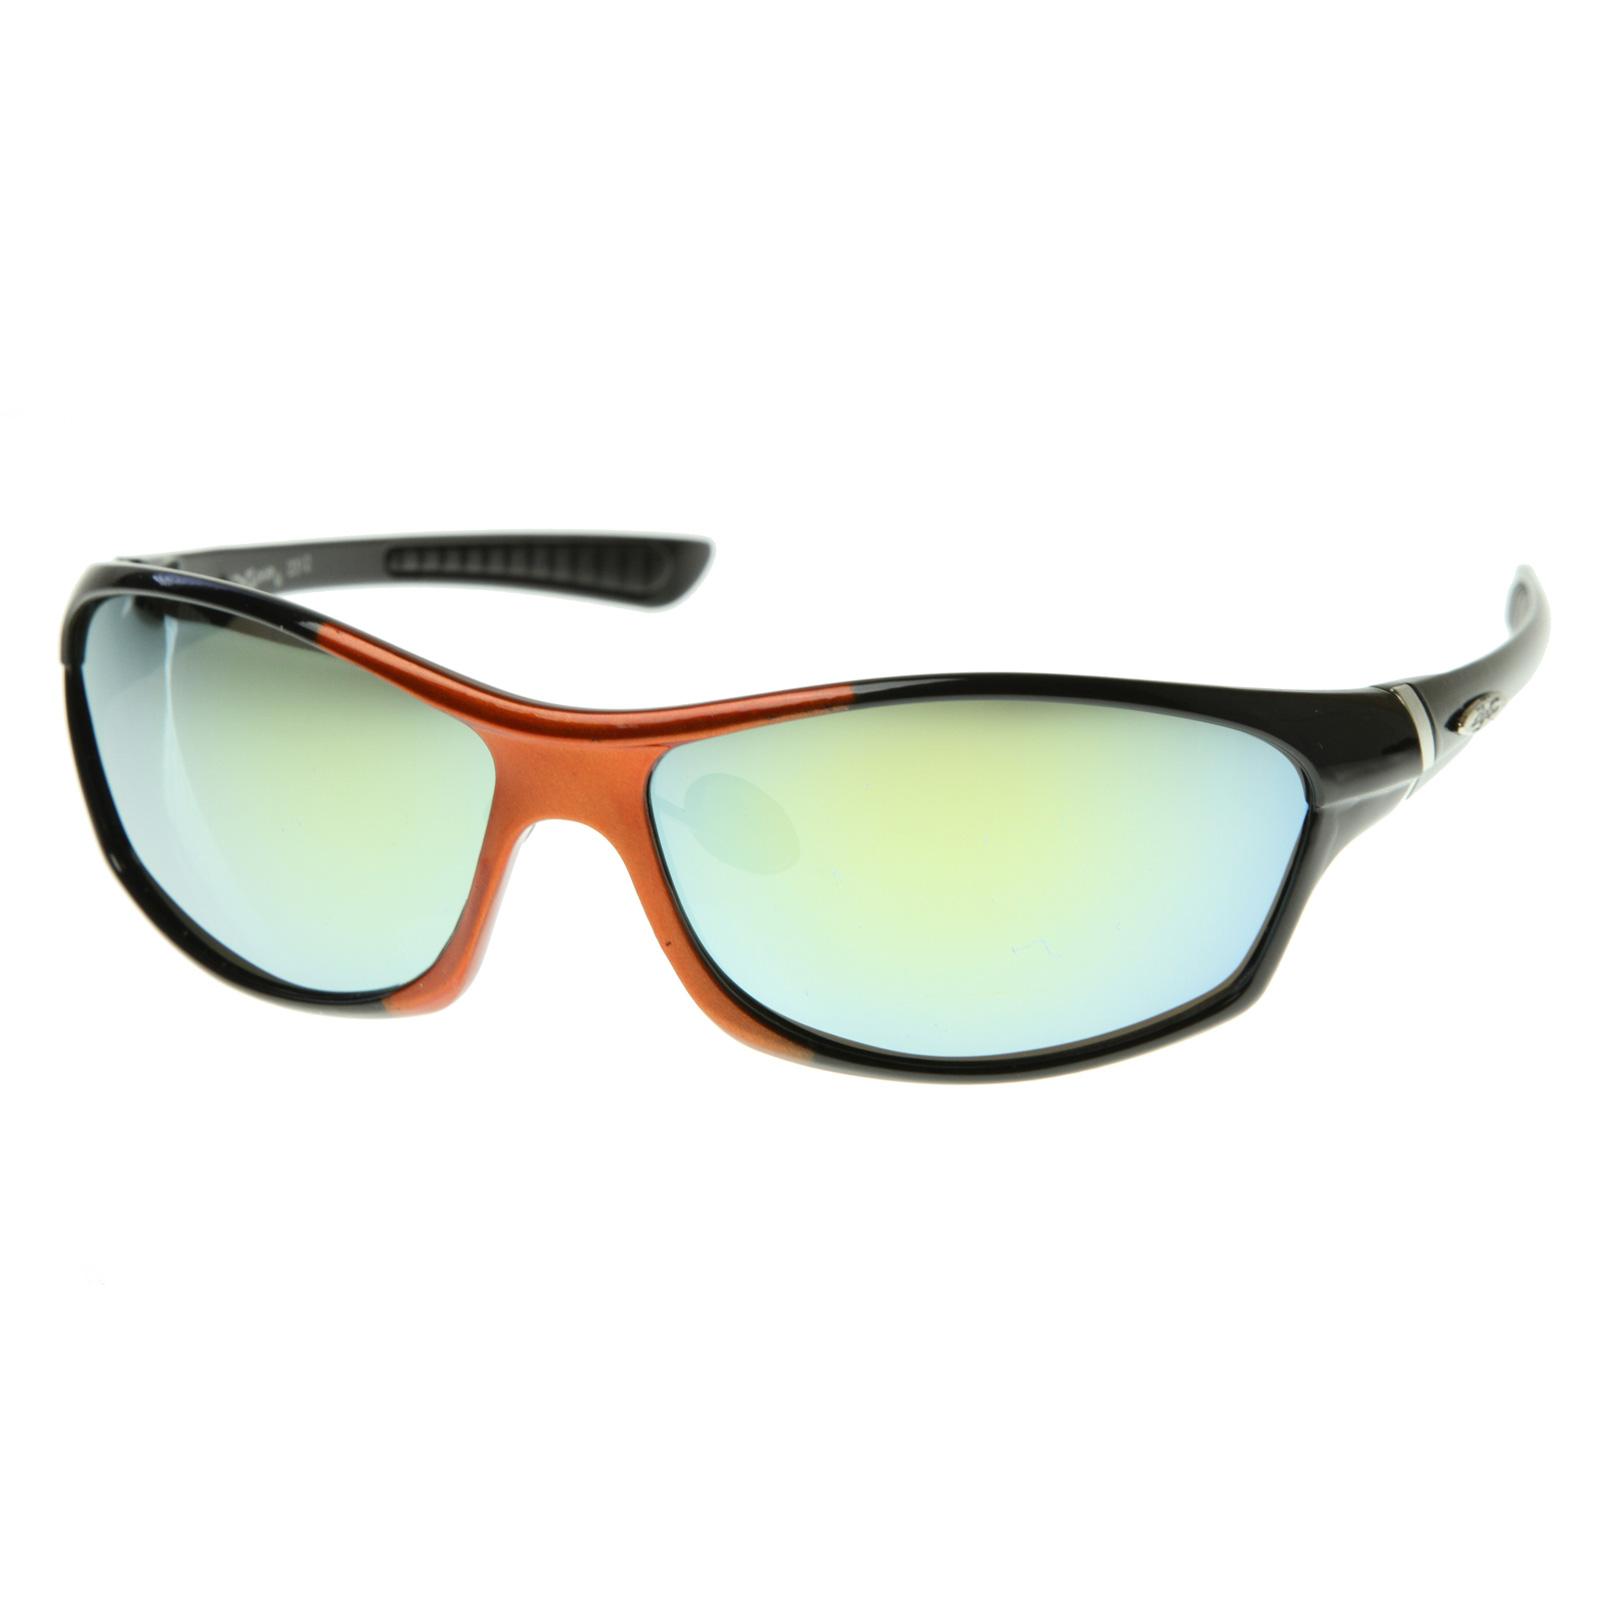 Xloop Sunglasses 45